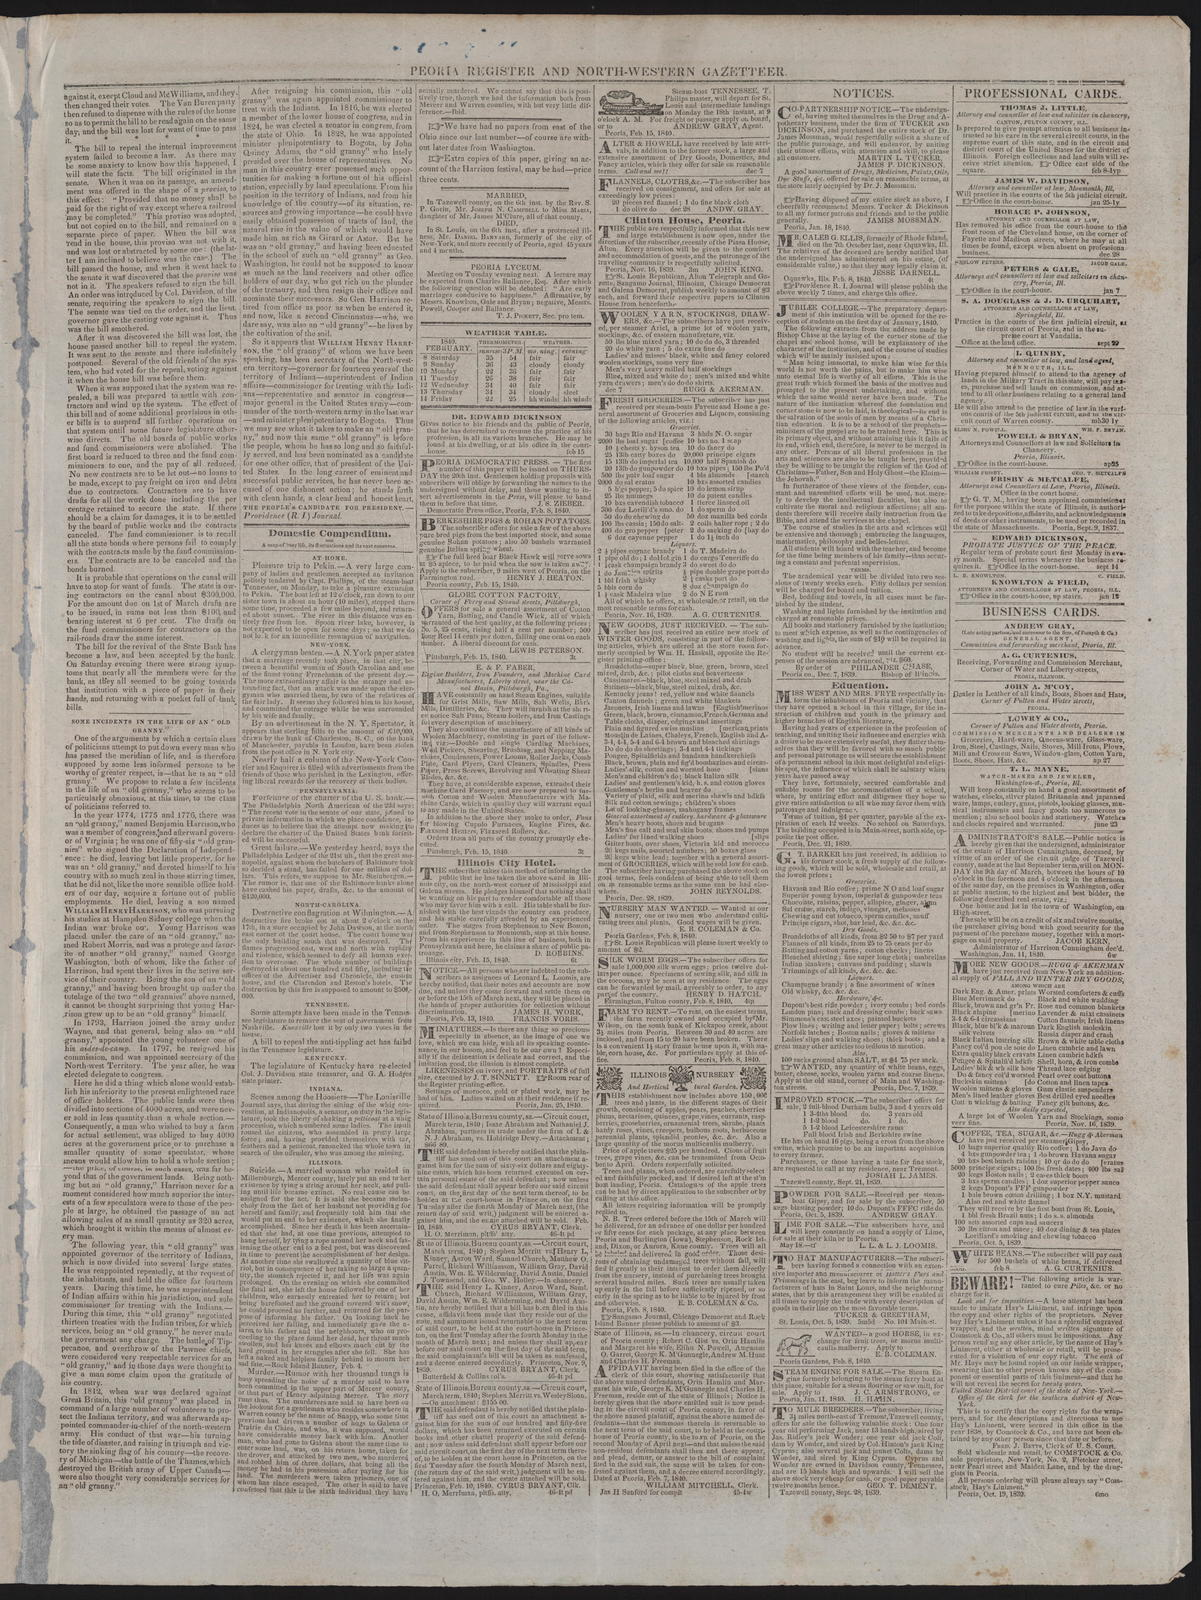 Peoria Register and North-Western Gazetteer, [newspaper]. February 15, 1840.